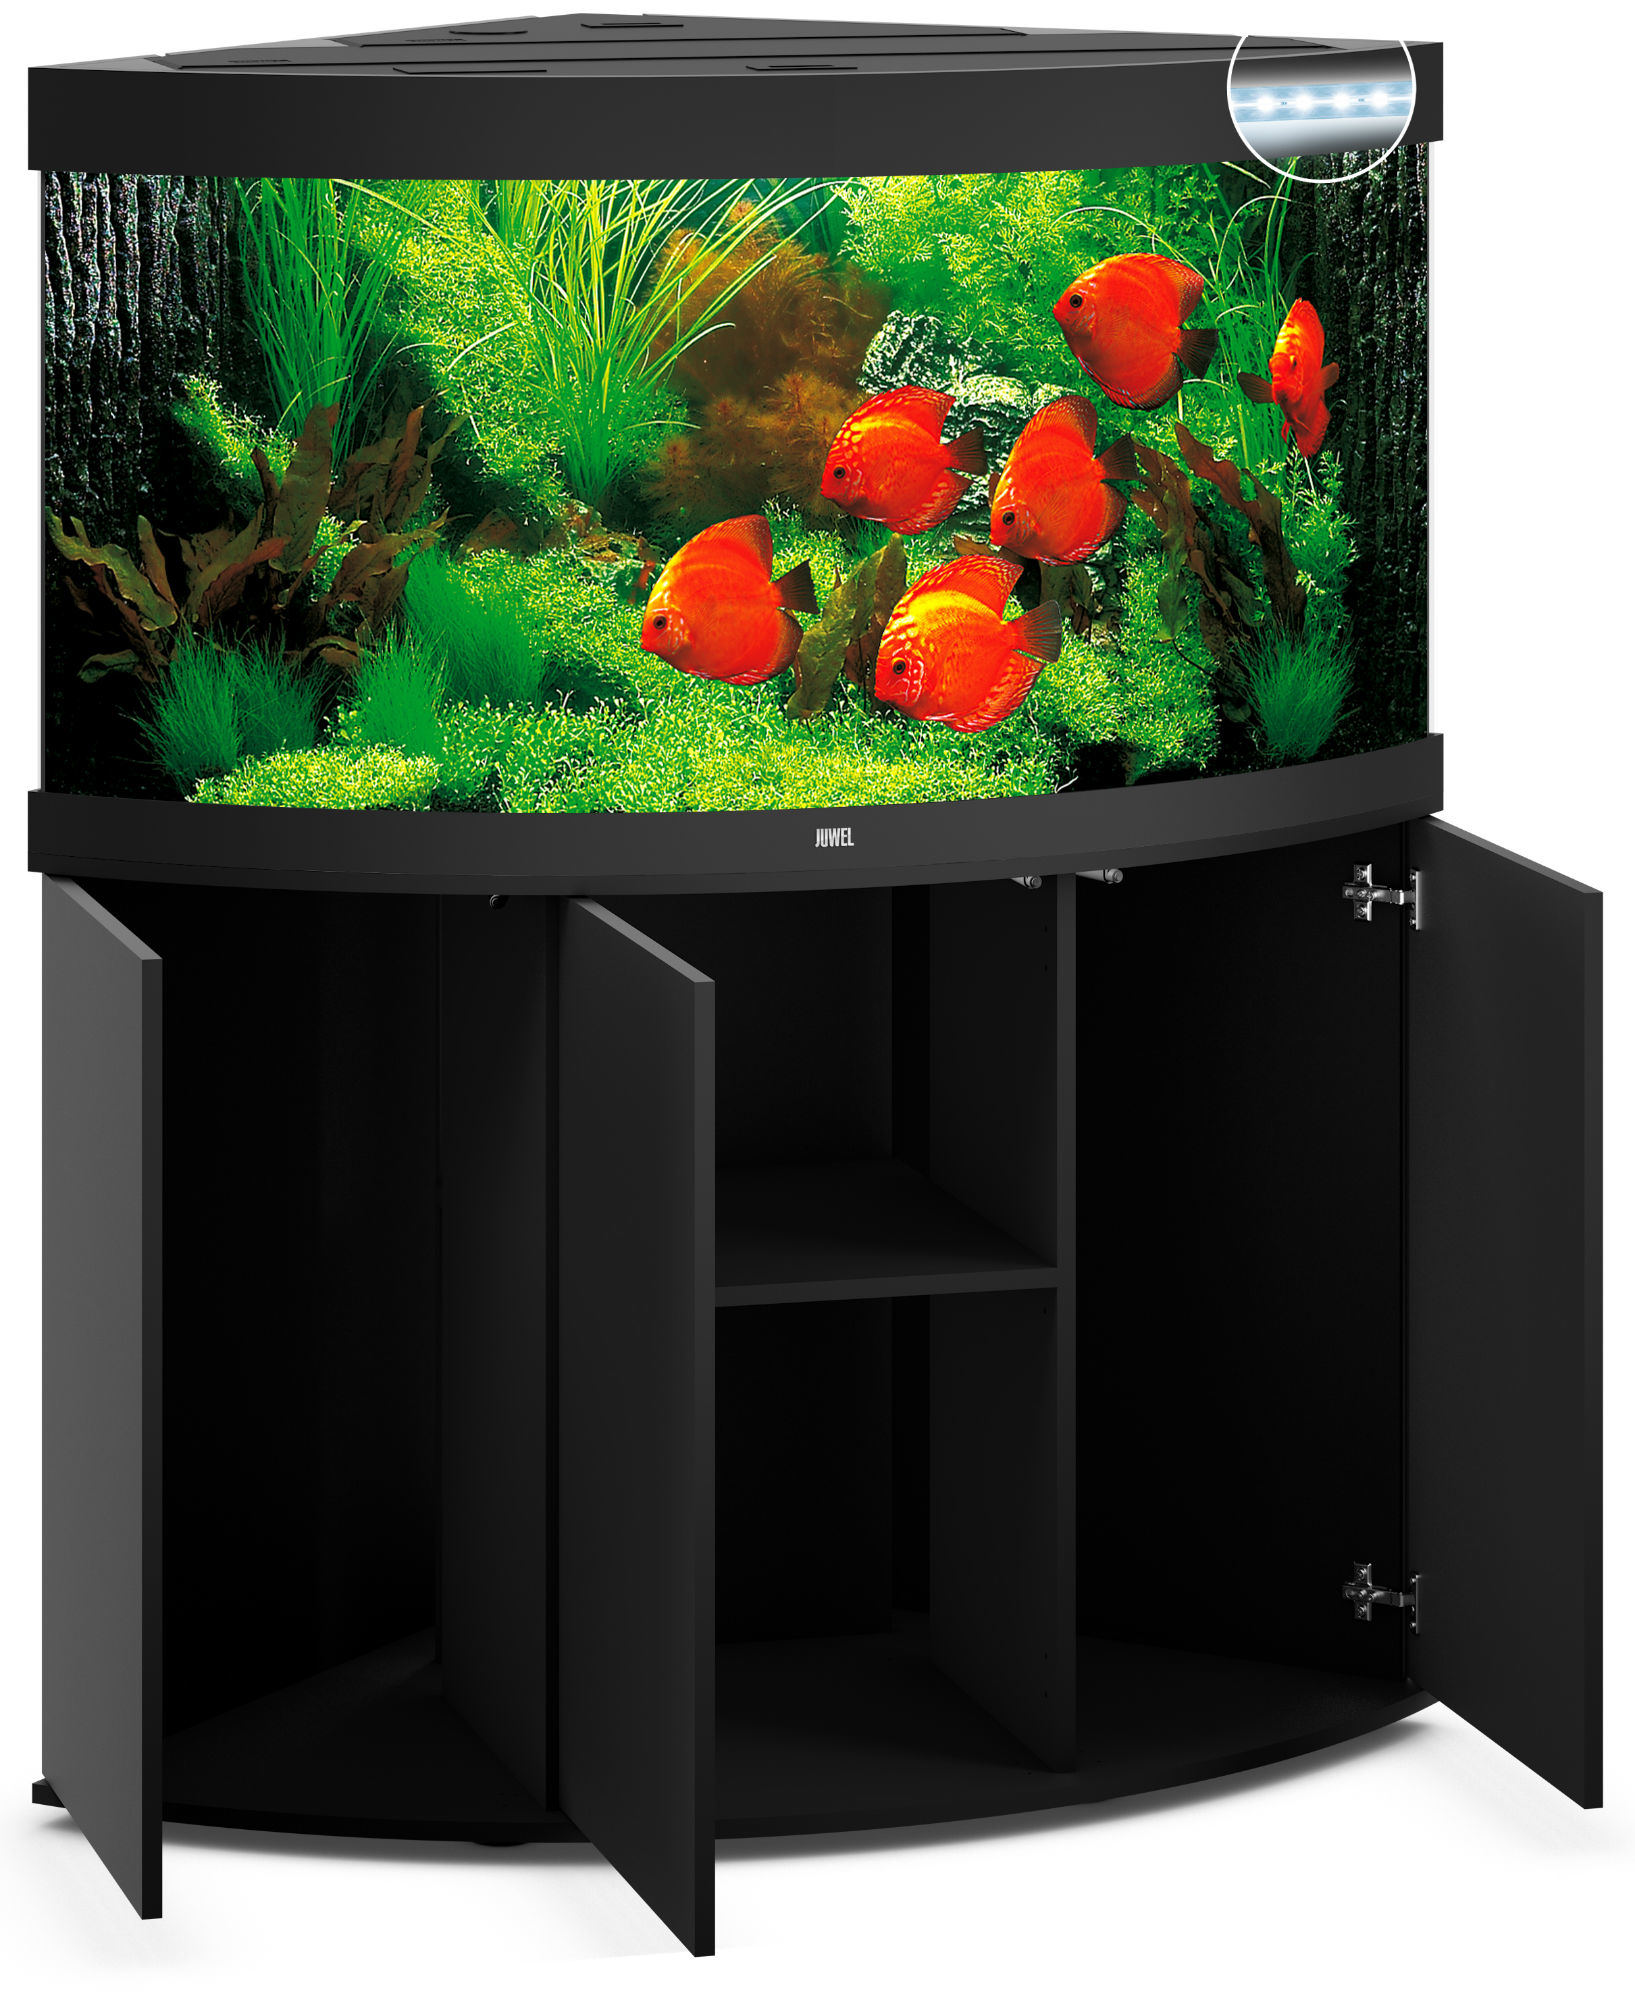 juwel trigon 350 led eck aquarium mit unterschrank ebay. Black Bedroom Furniture Sets. Home Design Ideas